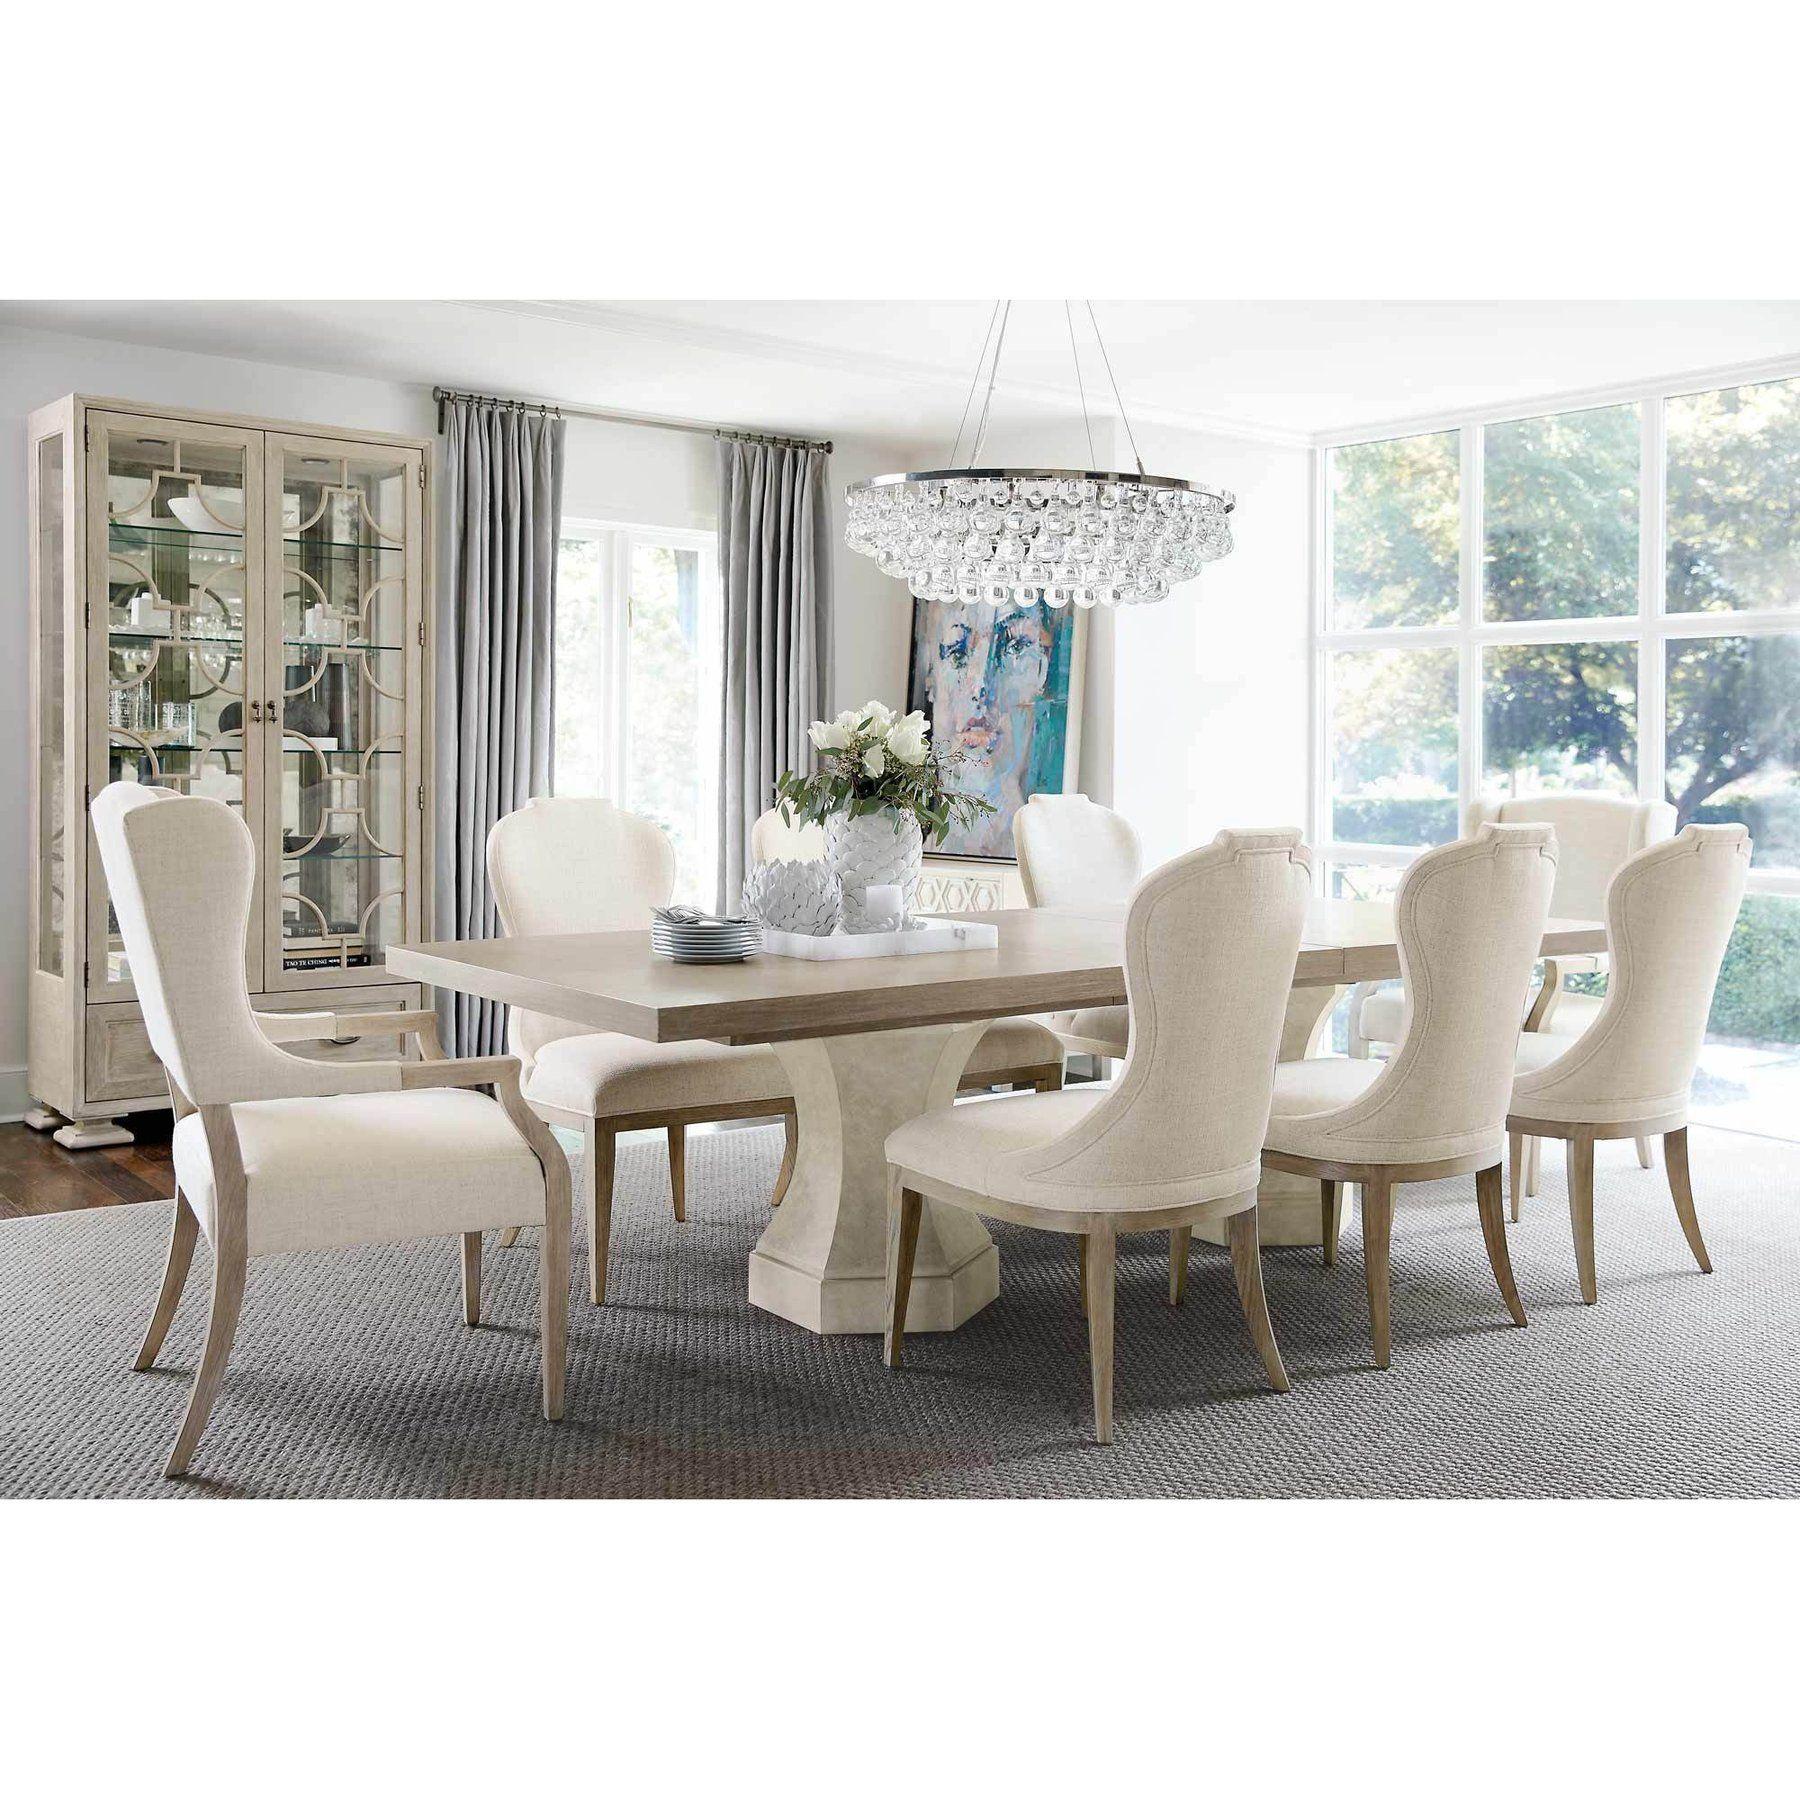 Bernhardt Santa Barbara Rectangular Dining Table